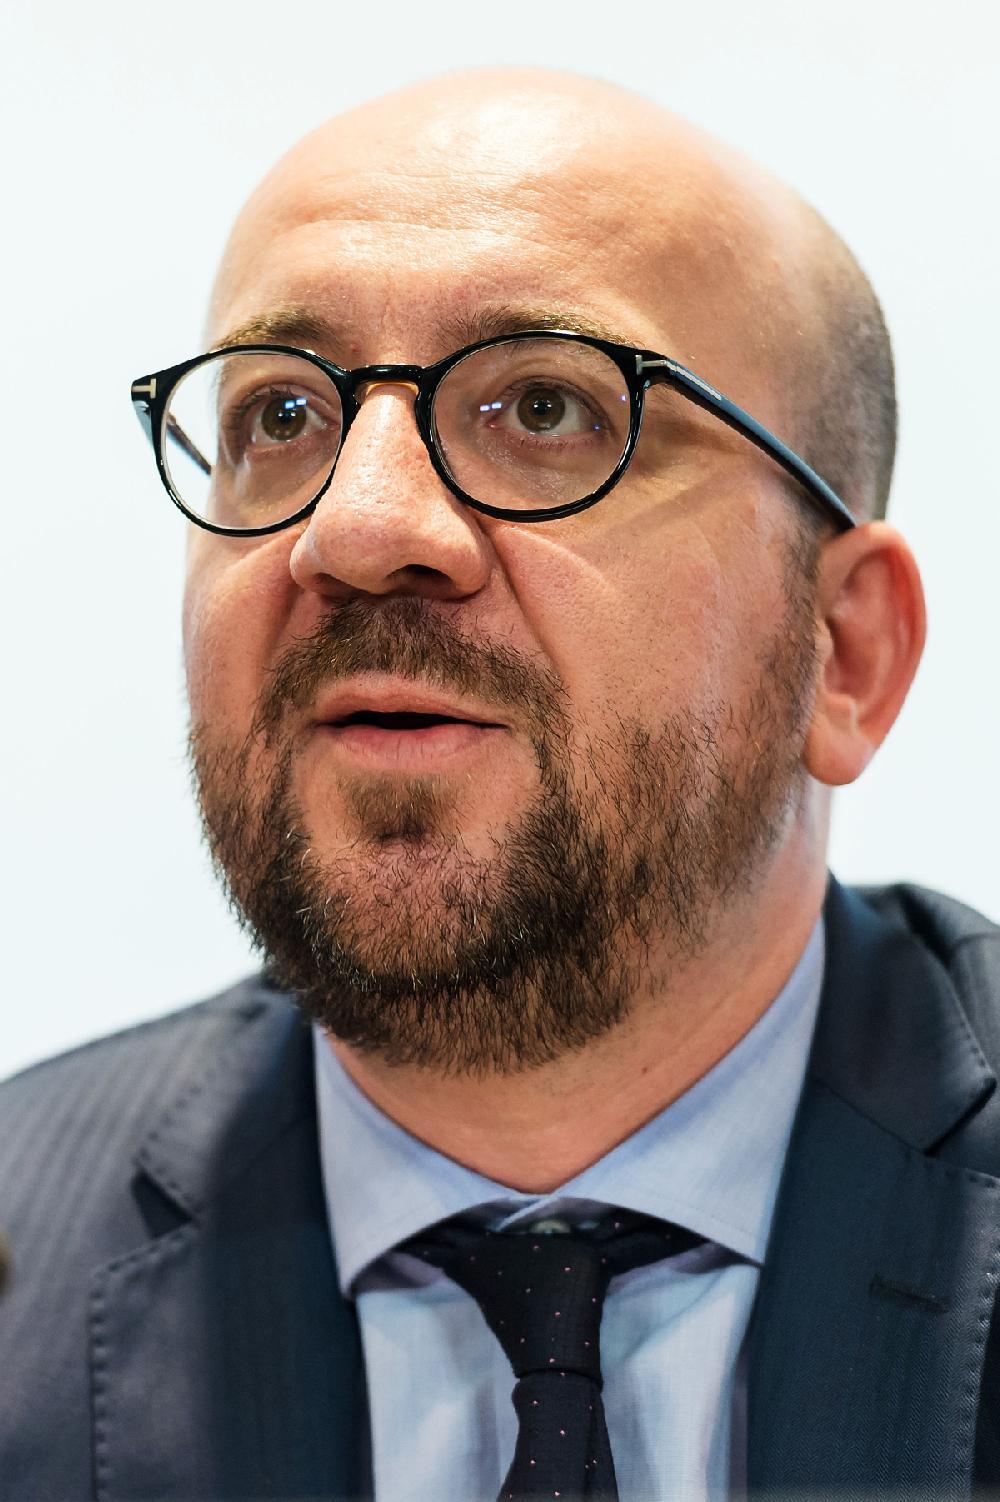 Michel Charles - Seduction